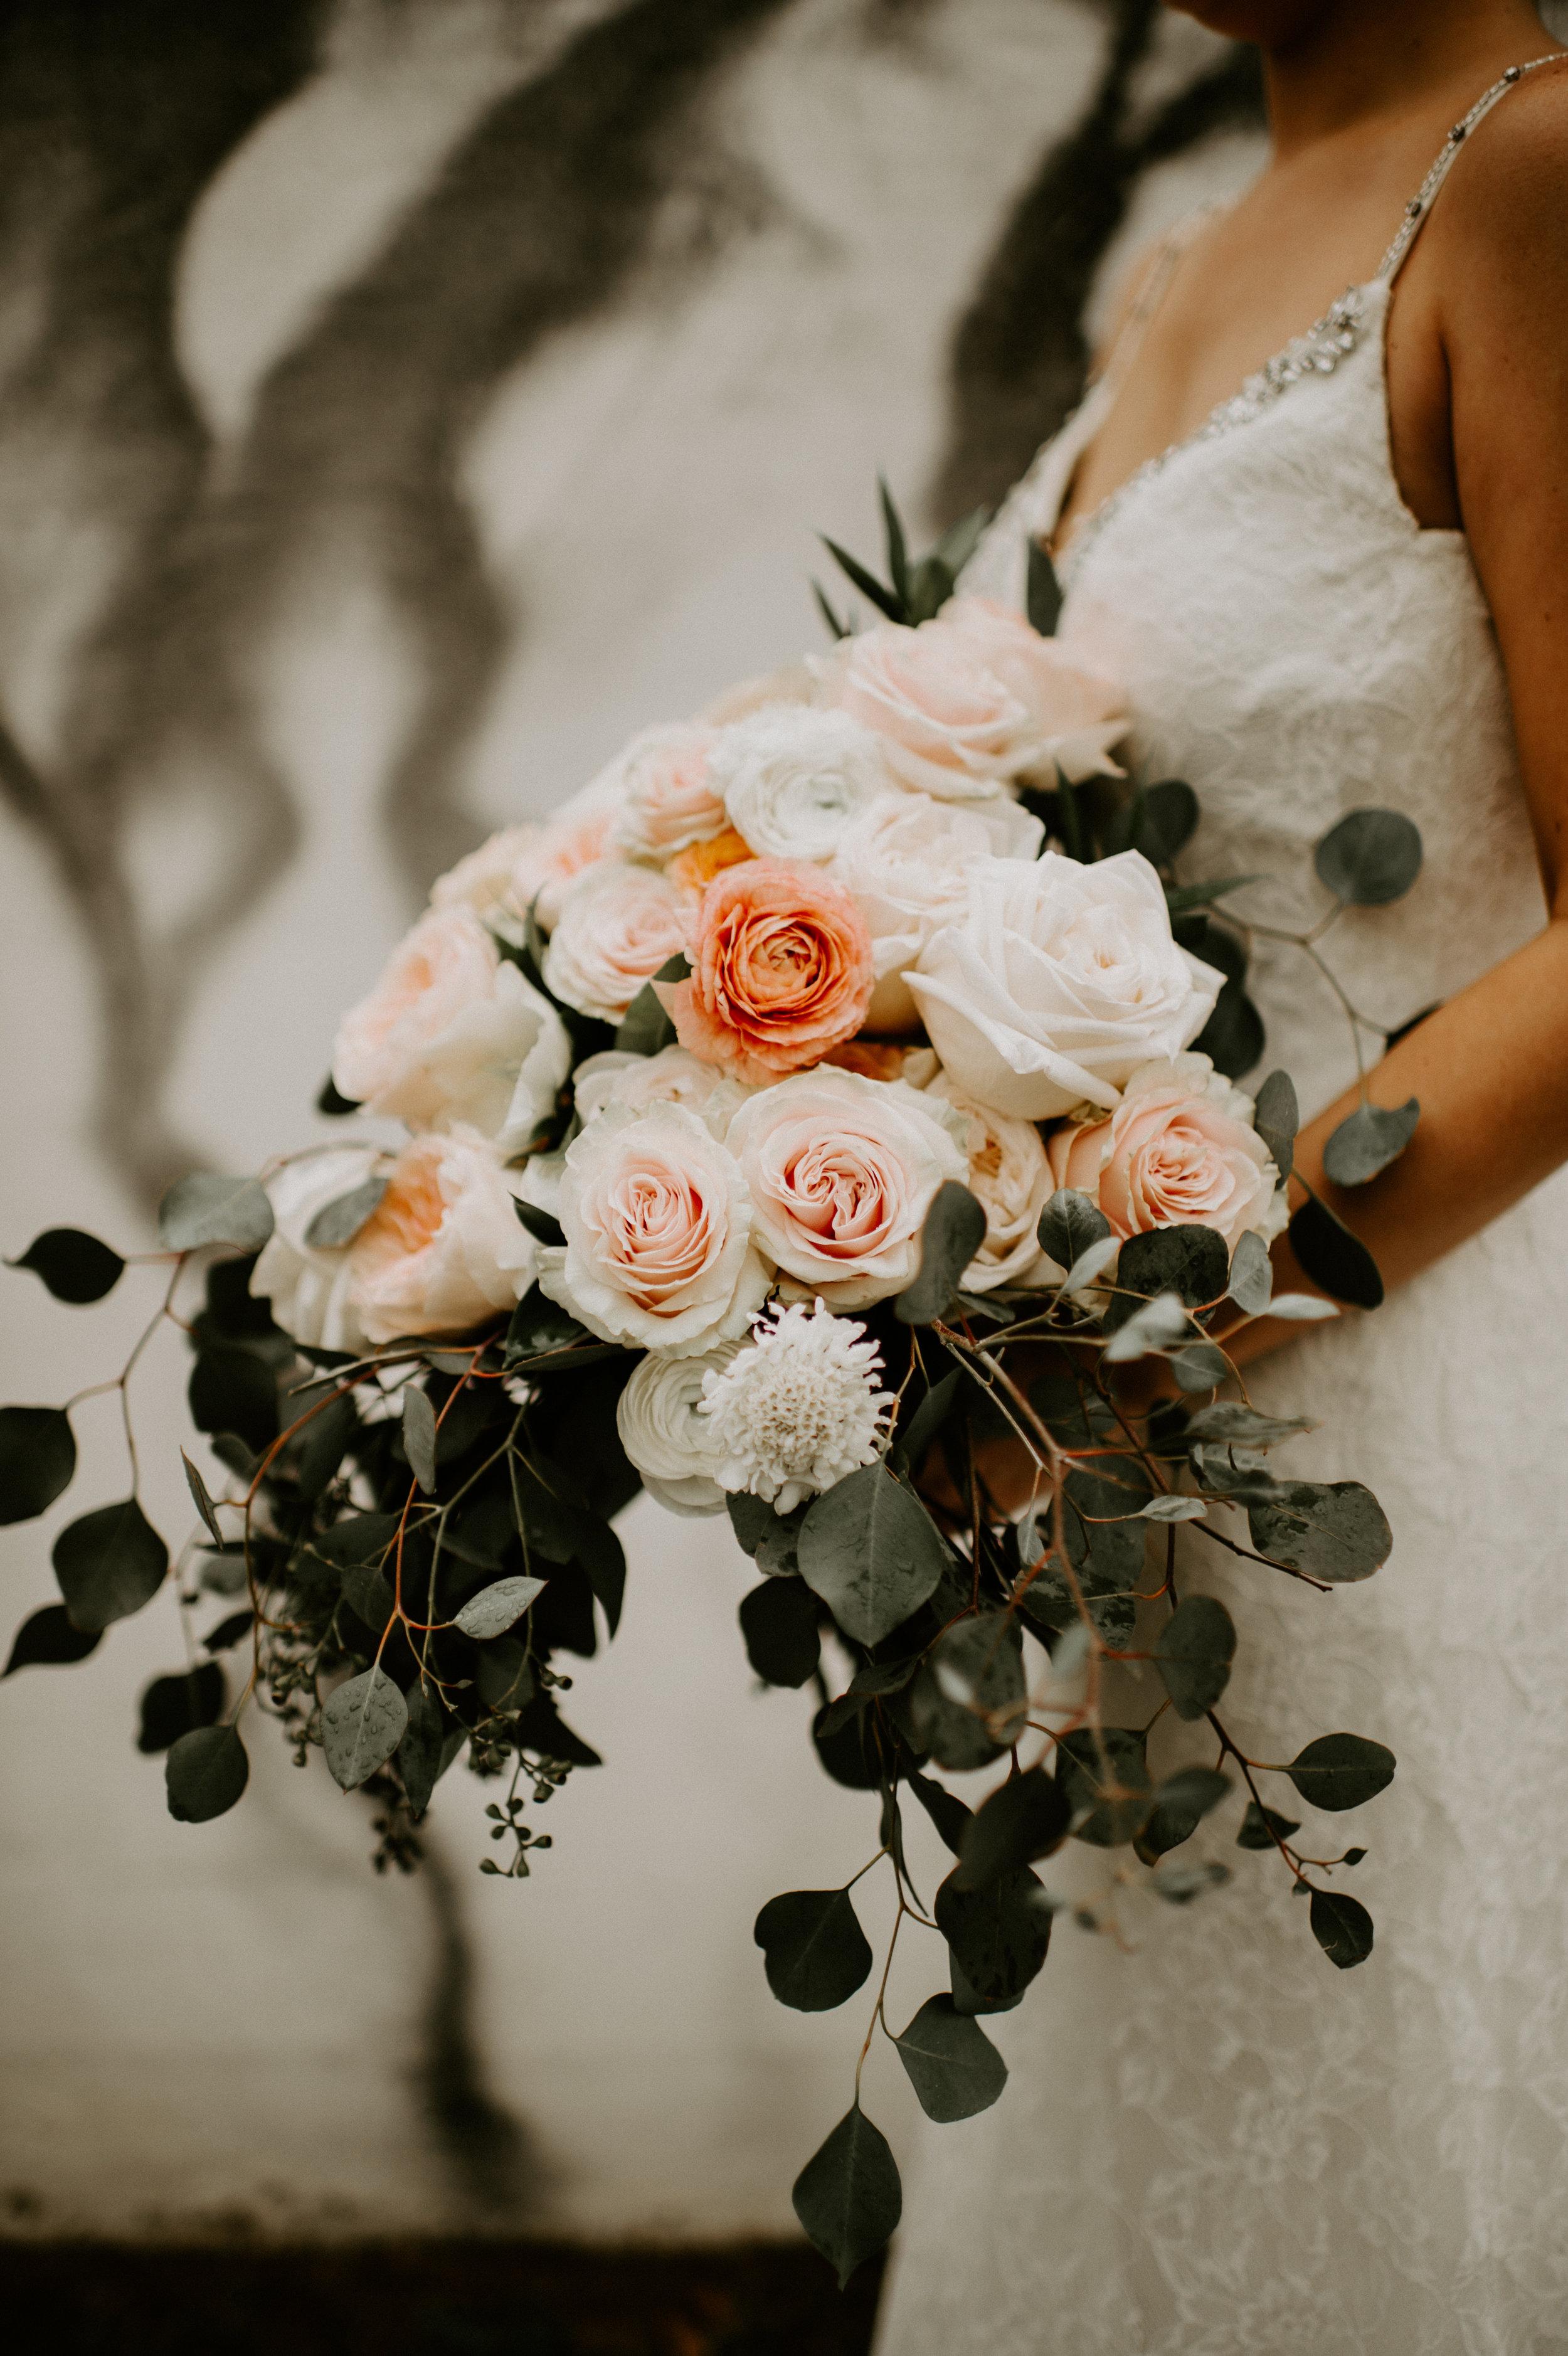 savannah-bridal-shop-andrea-and-mike-evergold-photography-georgia-state-railroad-museum-wedding-savannah-wedding-florist-savannah-wedding-planner-38.jpg